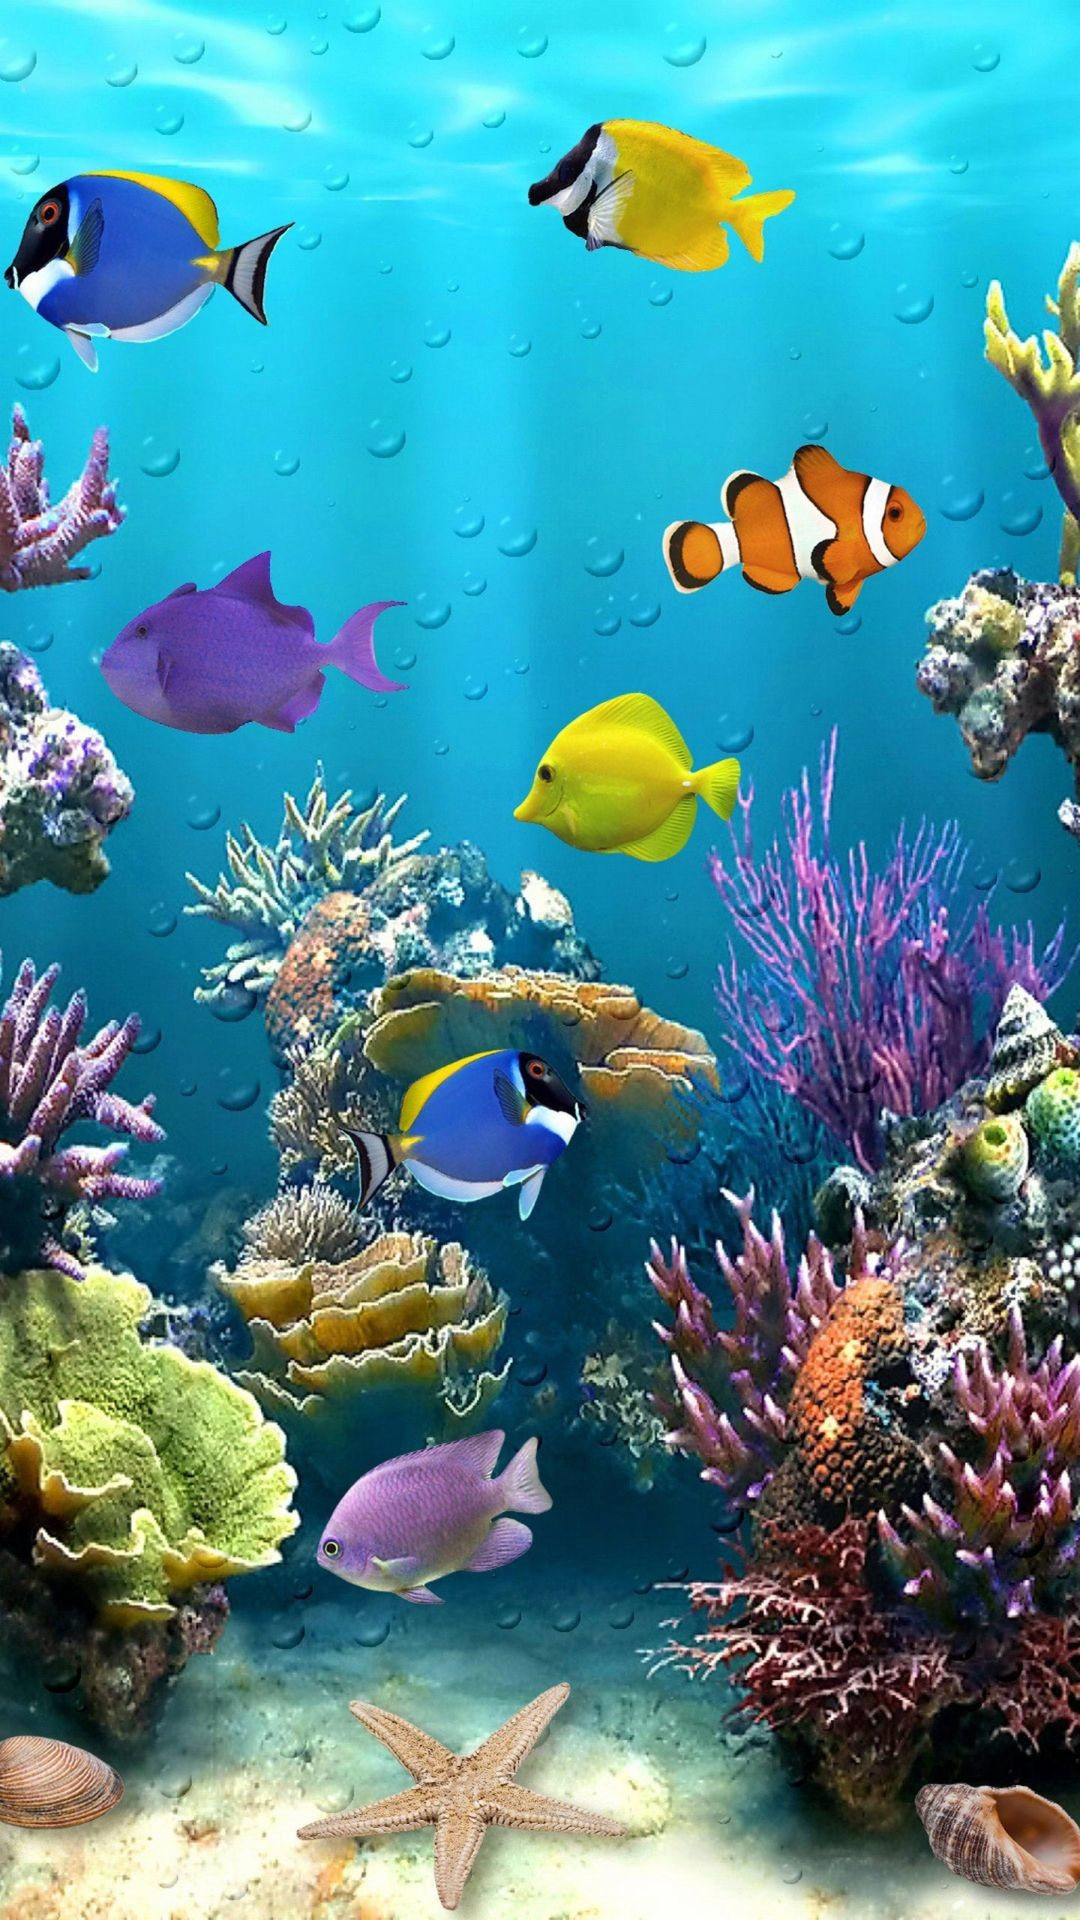 Koi Fish Live Wallpaper (56+ images)